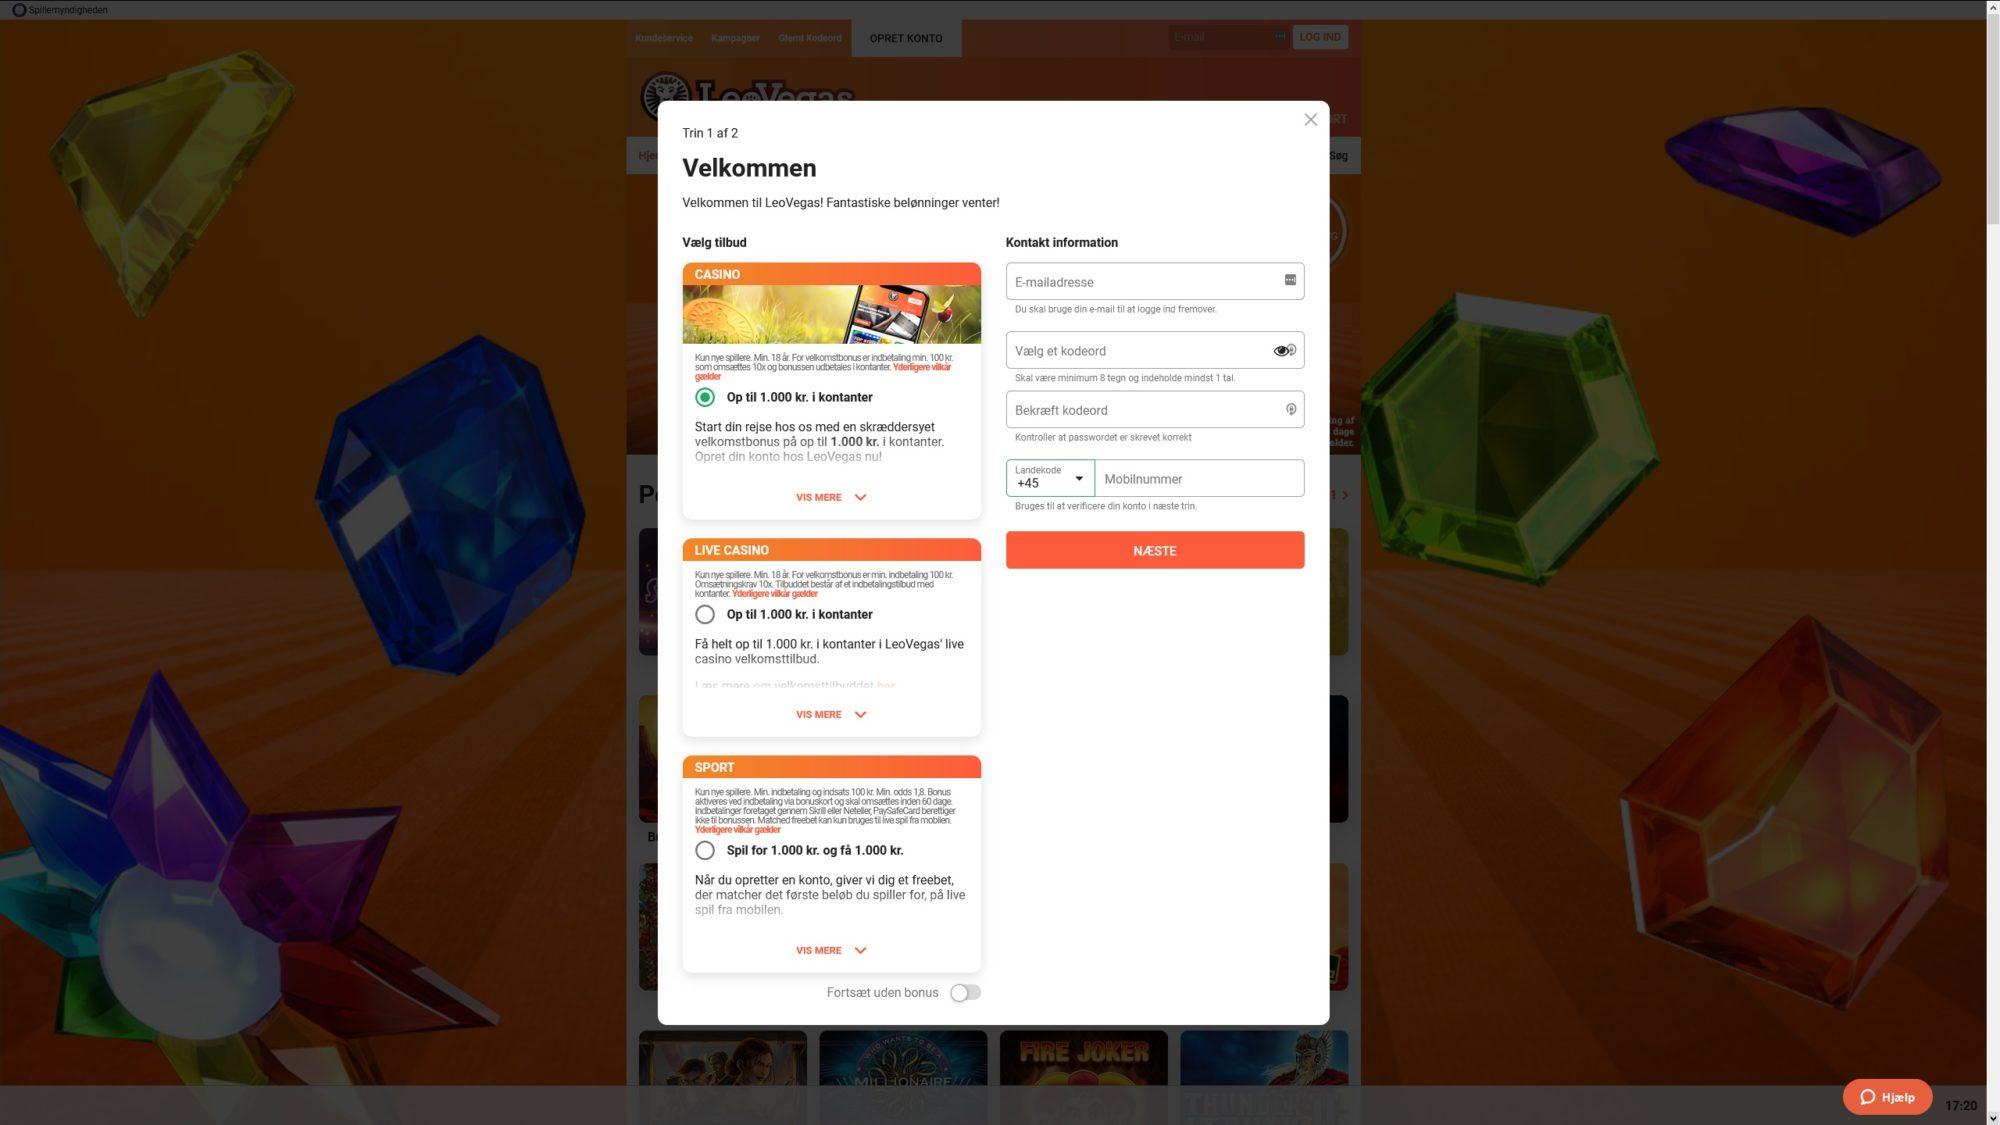 Claim Your LeoVegas Casino Promotion Code